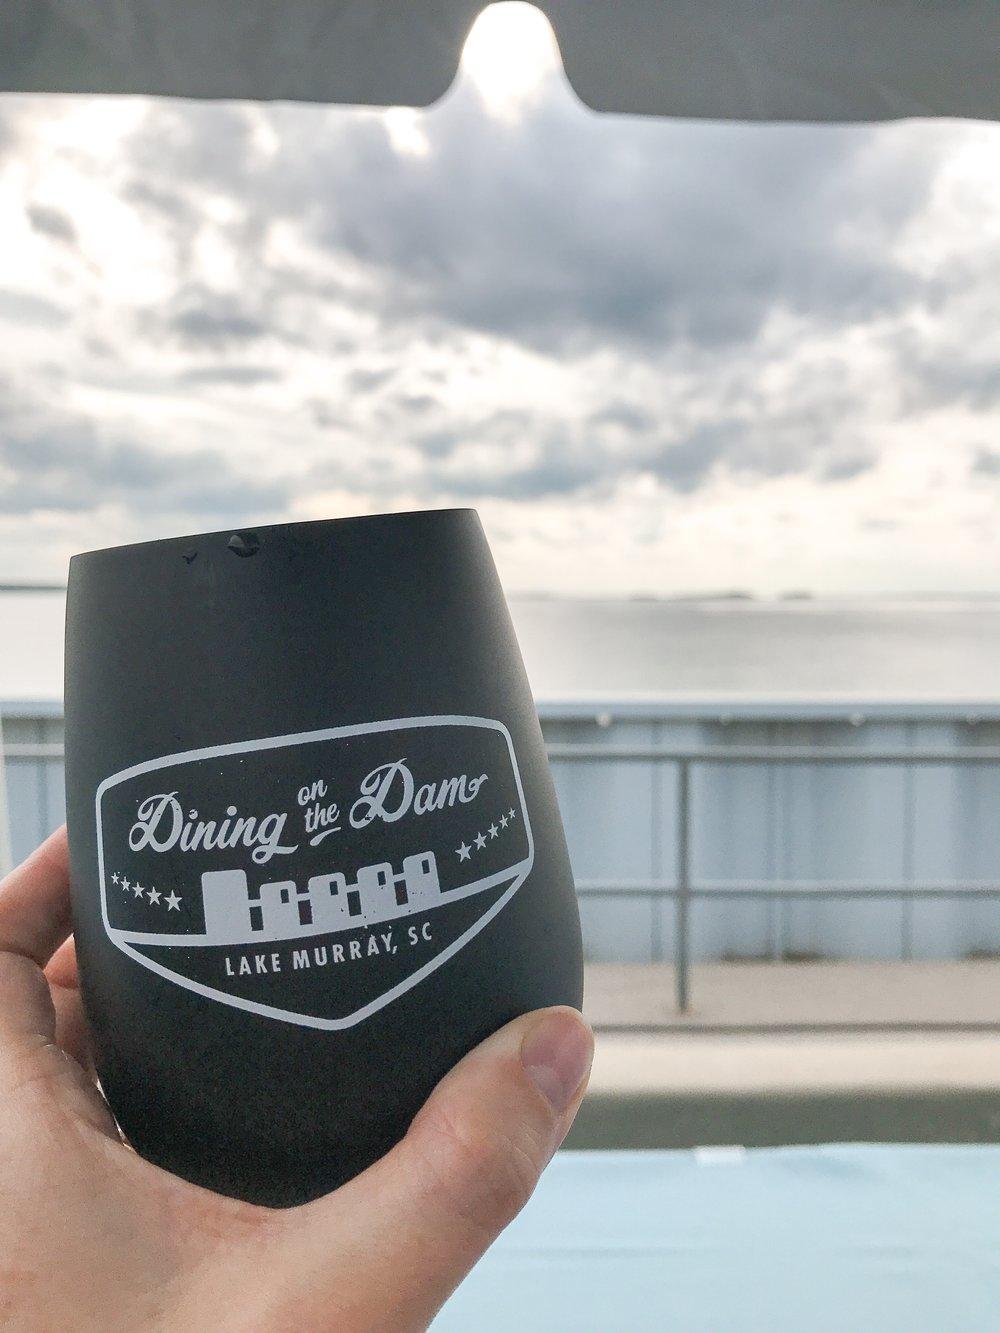 Fun, commemorative event mug!